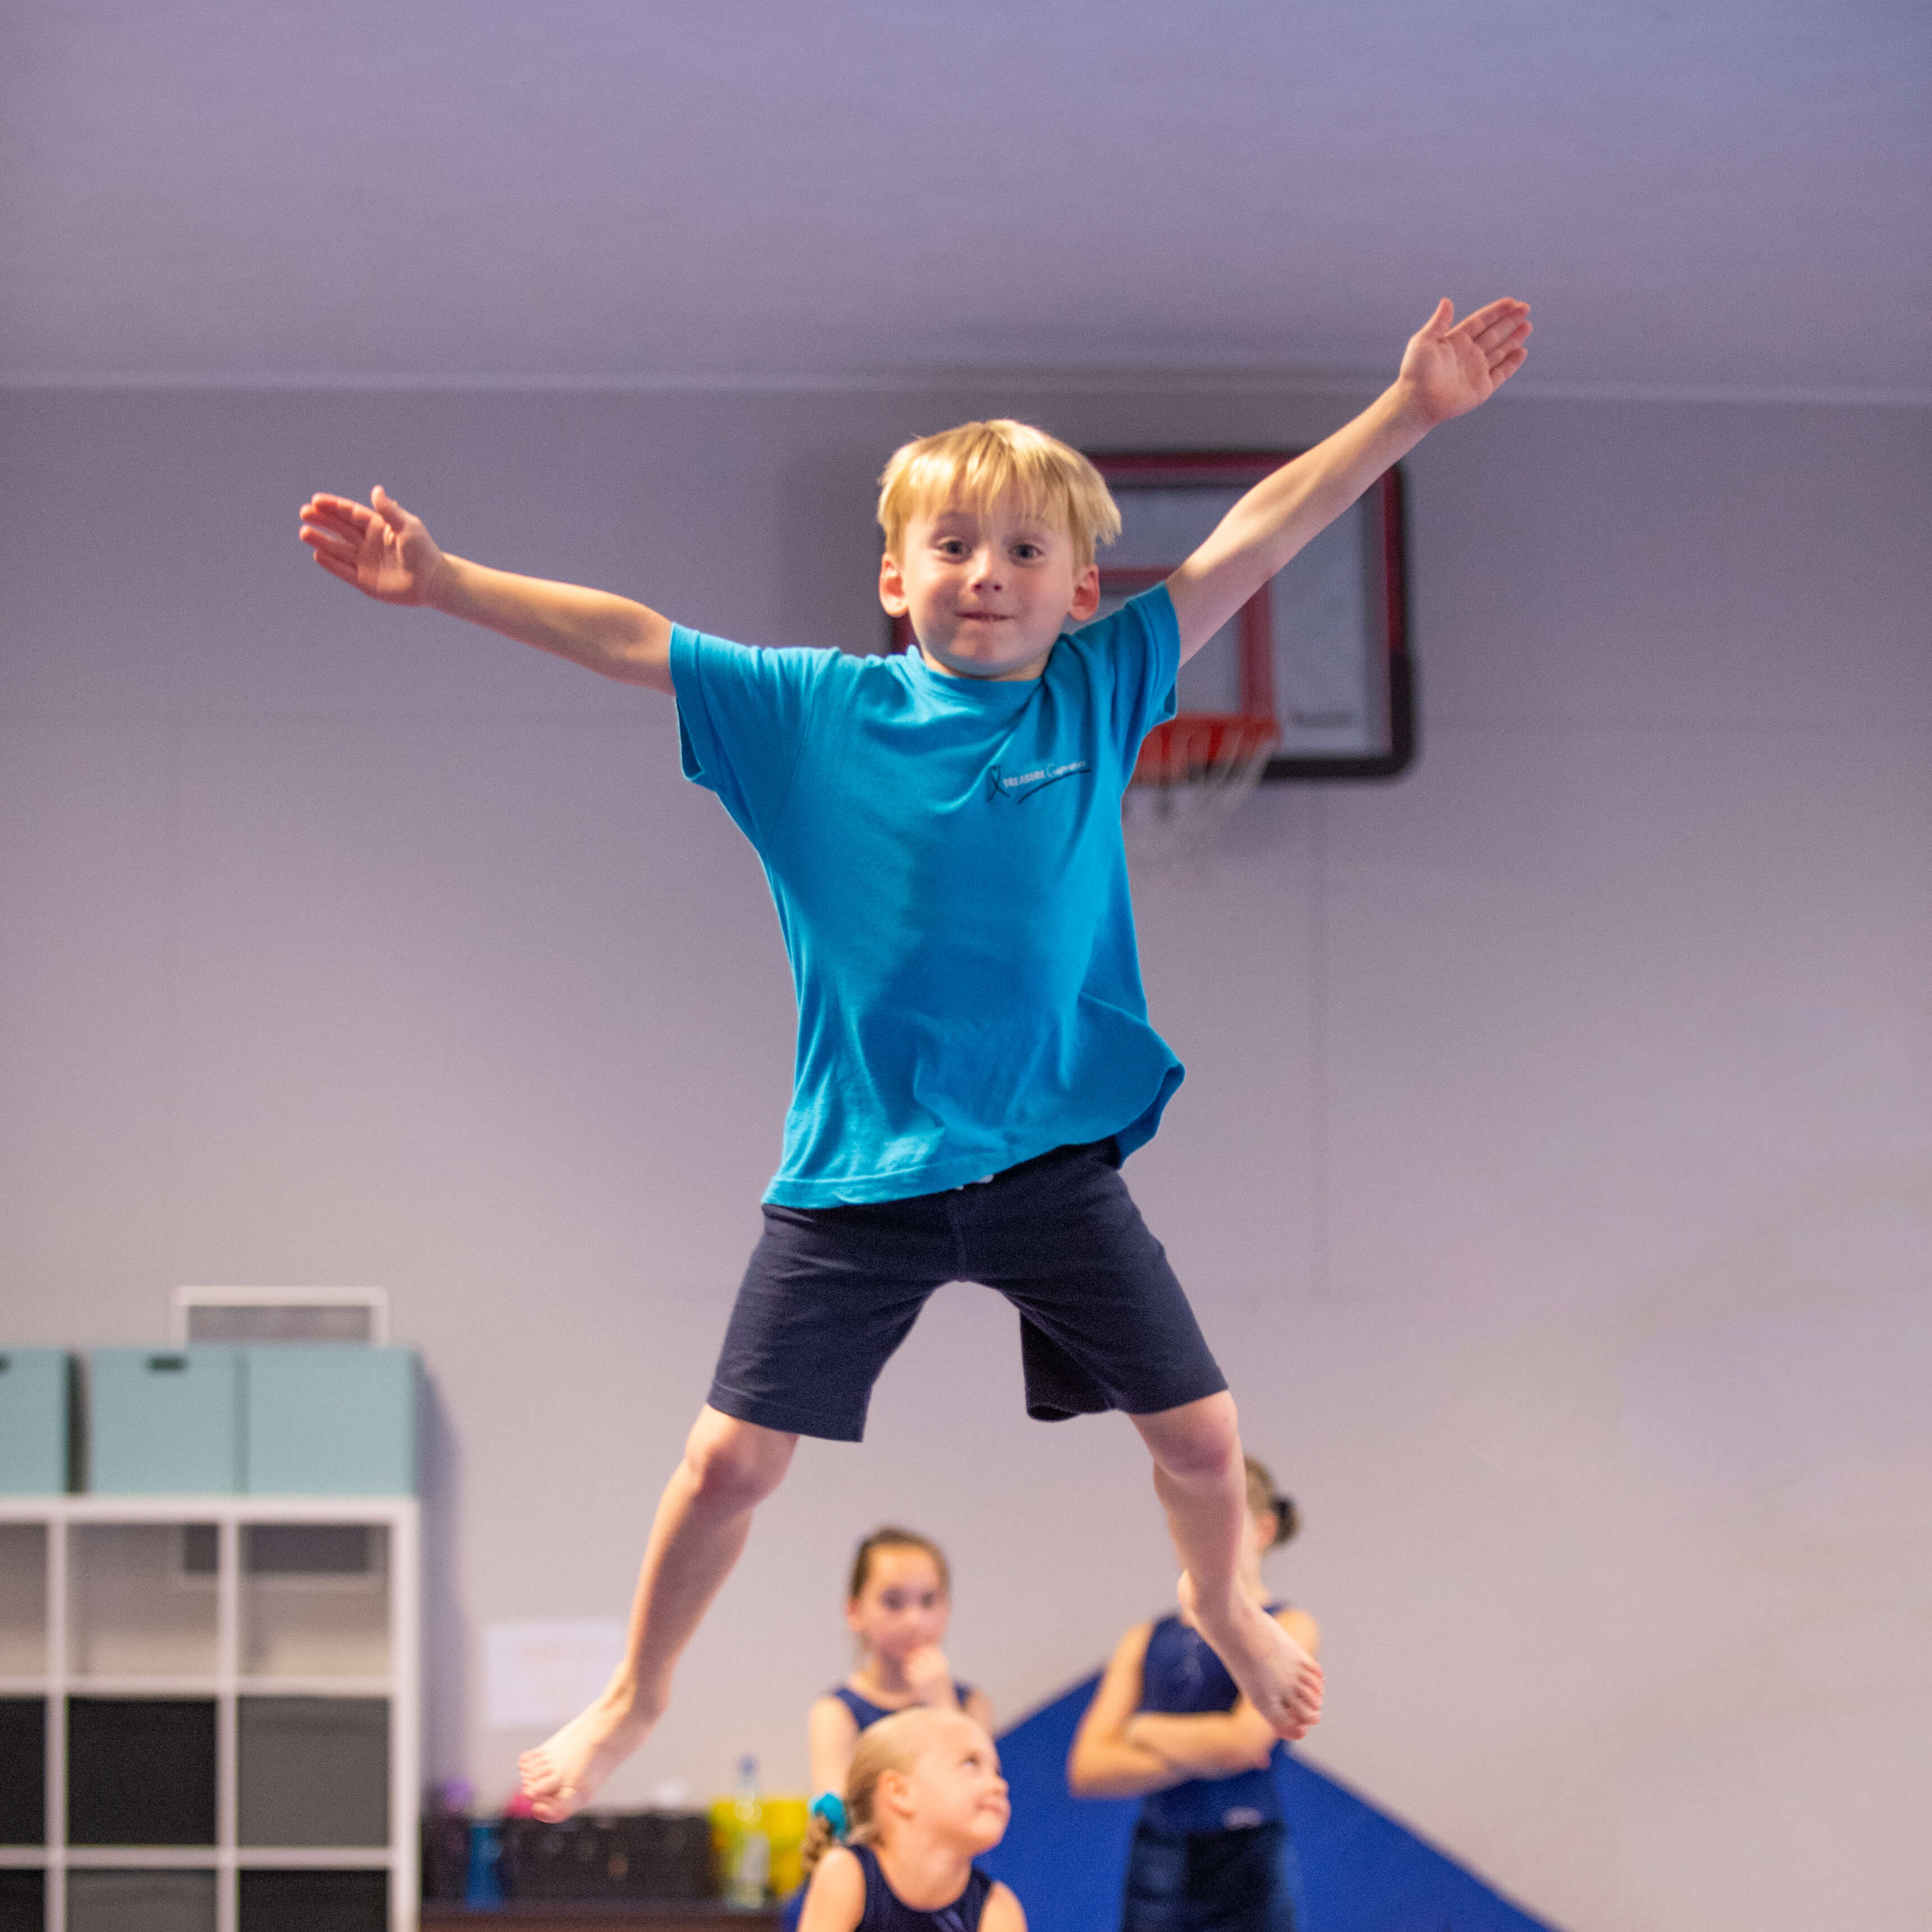 Child jumping having fun